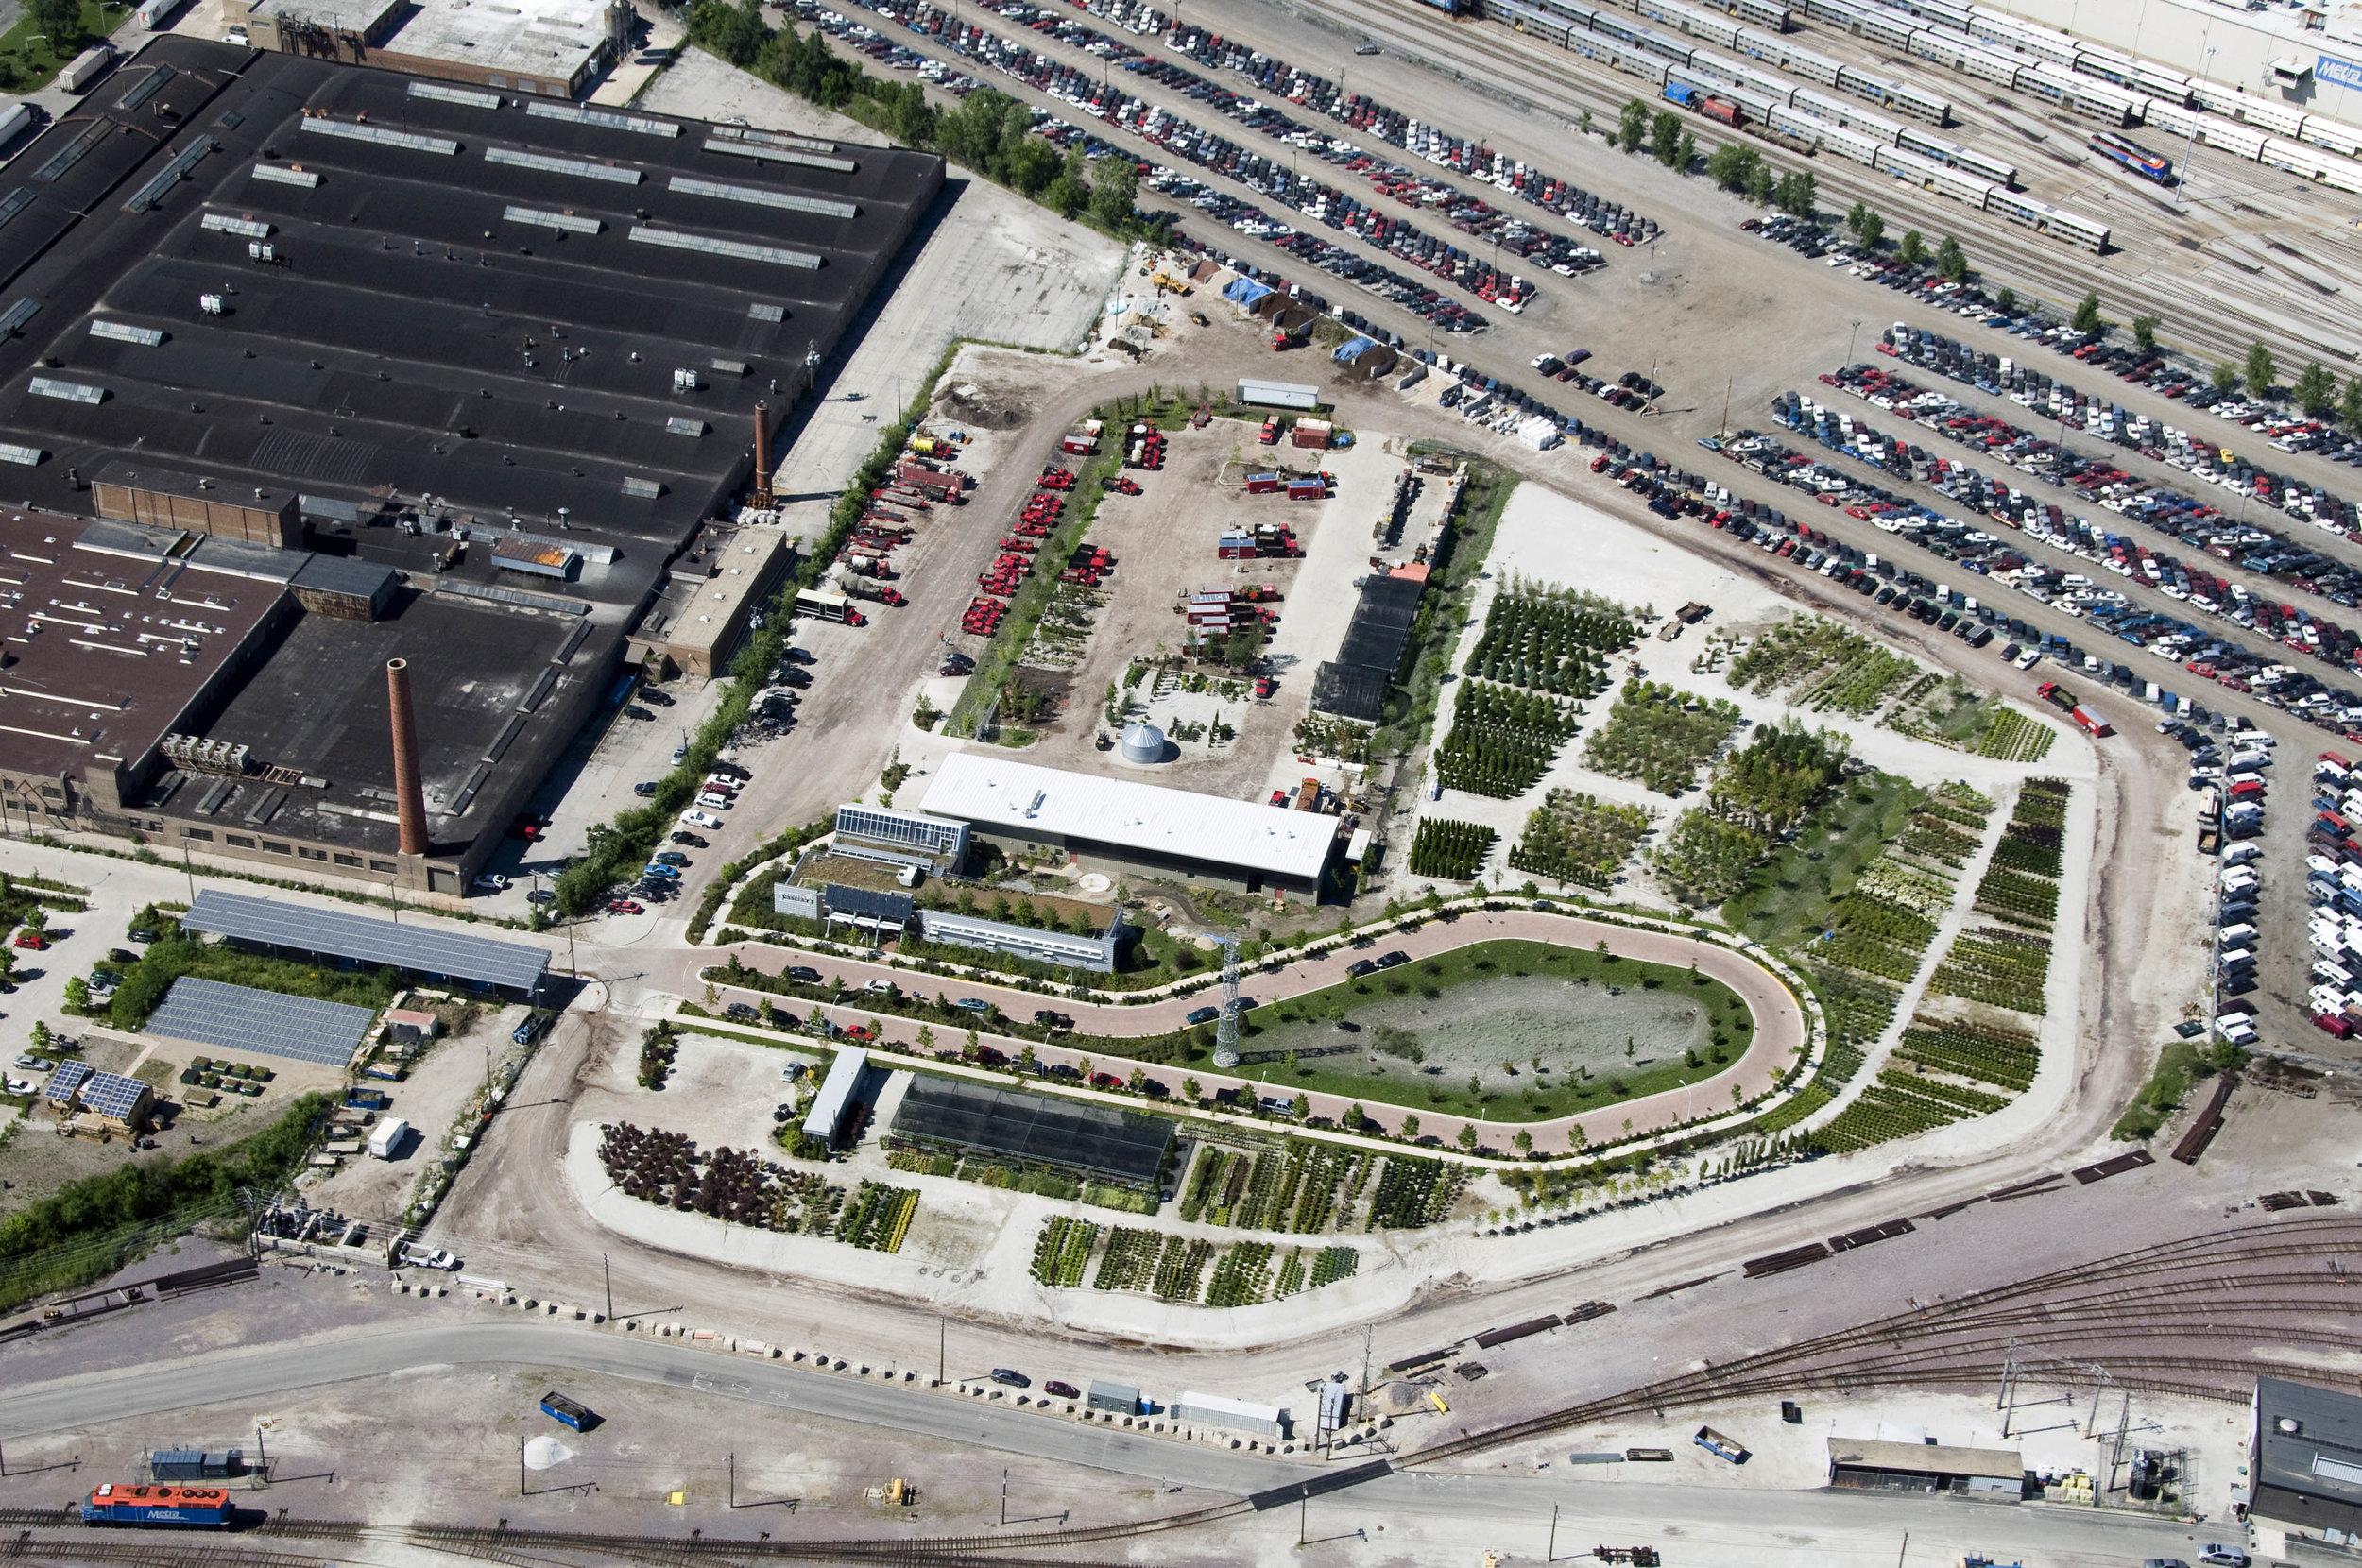 Rancho Verde Eco Industrial Park   Christy Webber Landscapes - Chicago, IL